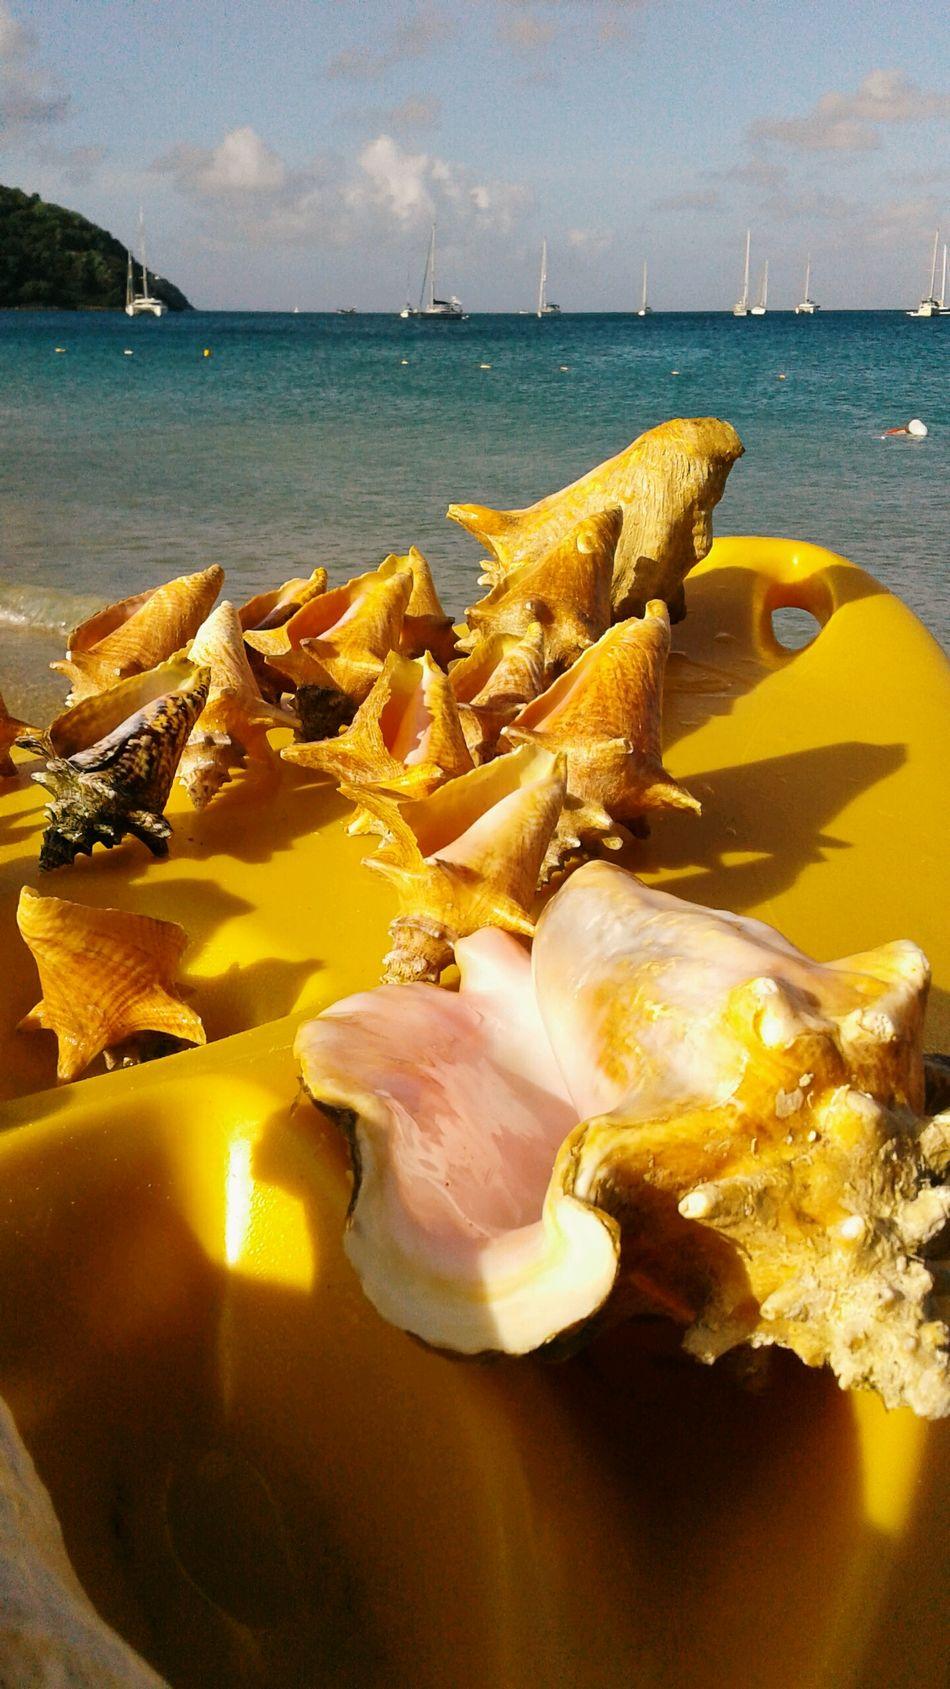 Conch shells. Conchshell Transportation Sea Colour Of Life Sky Outdoors Beachlife Beach Close-up Isnaplife